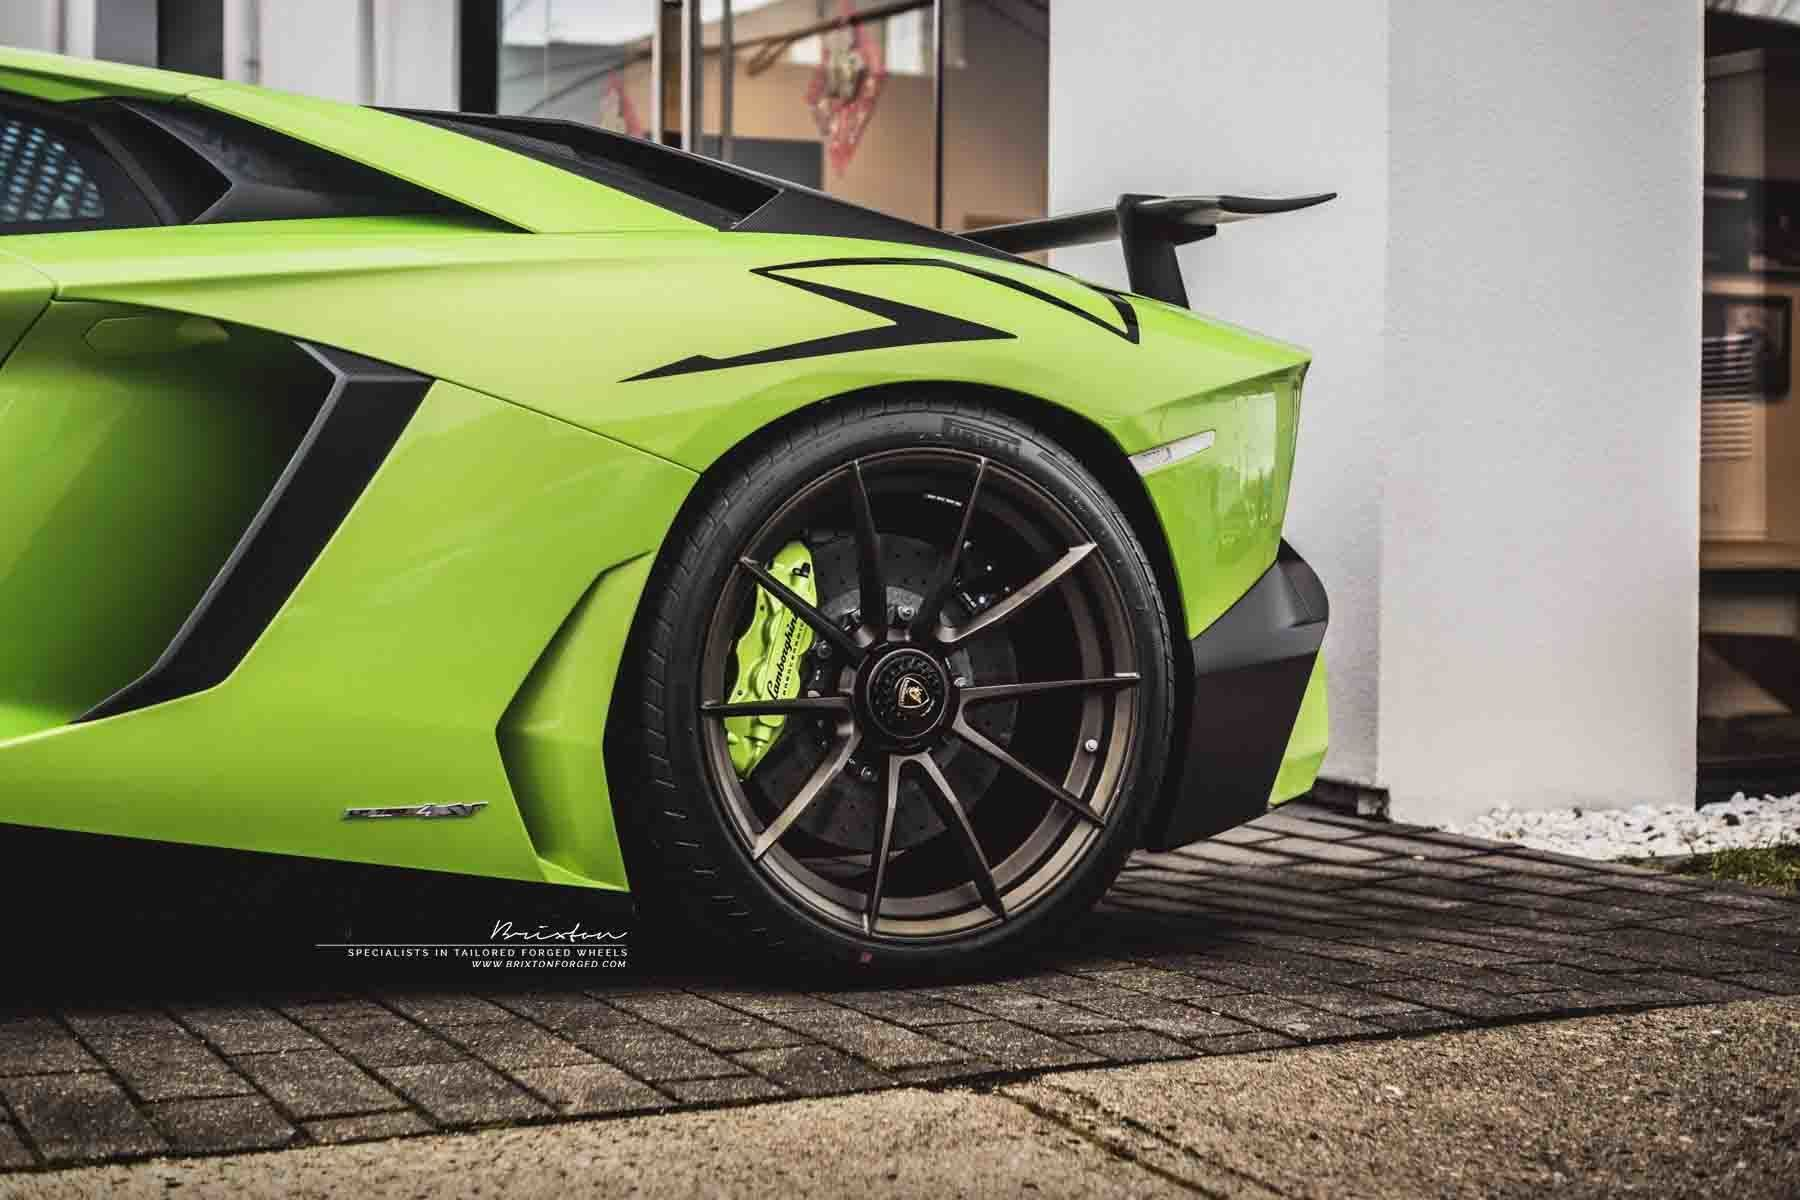 images-products-1-2403-232974691-verde-scandal-lamborghini-aventador-sv-lp750-4-brixton-forged-wheels-wr3-ultrasport-fine-texture.jpg